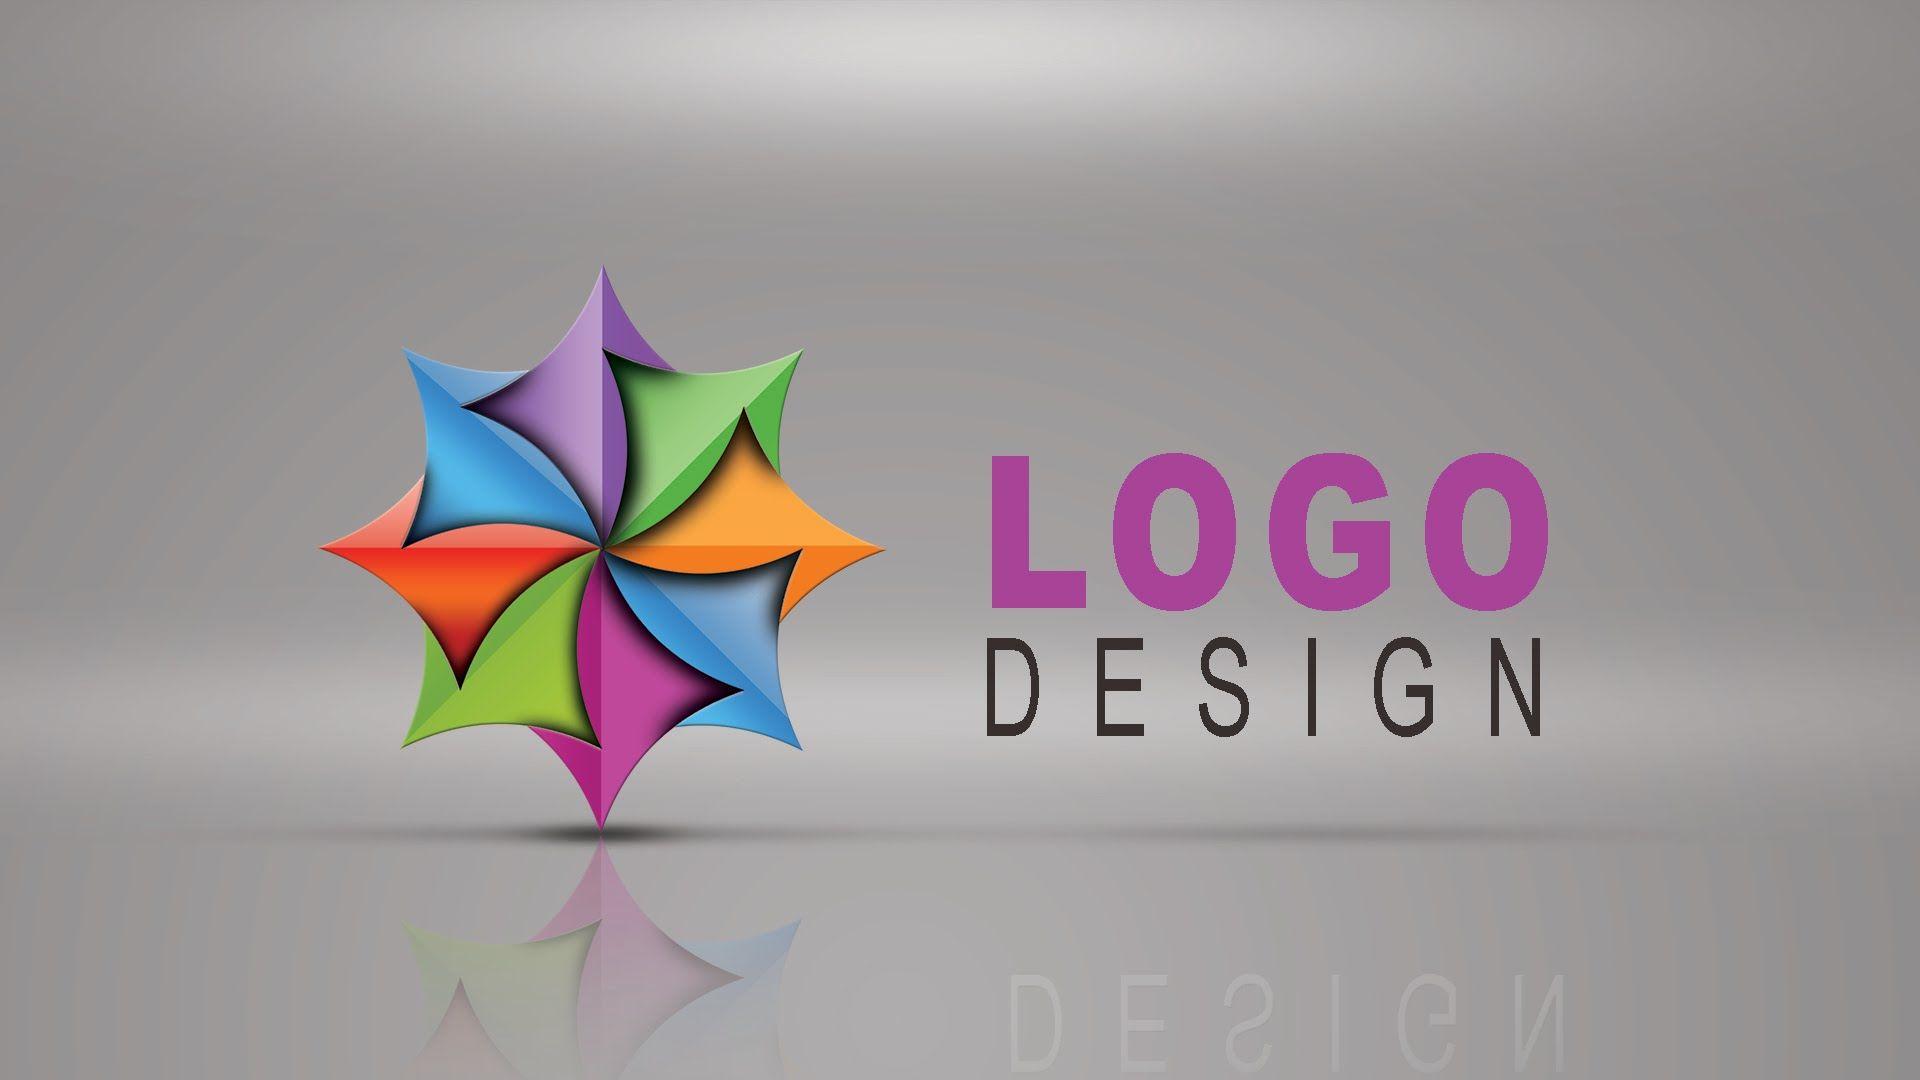 Photoshop tutorial professional logo design in hindi urdu photoshop tutorial professional logo design in hindi urdu webdesign pinterest professional logo design professional logo and photoshop tutorial baditri Gallery